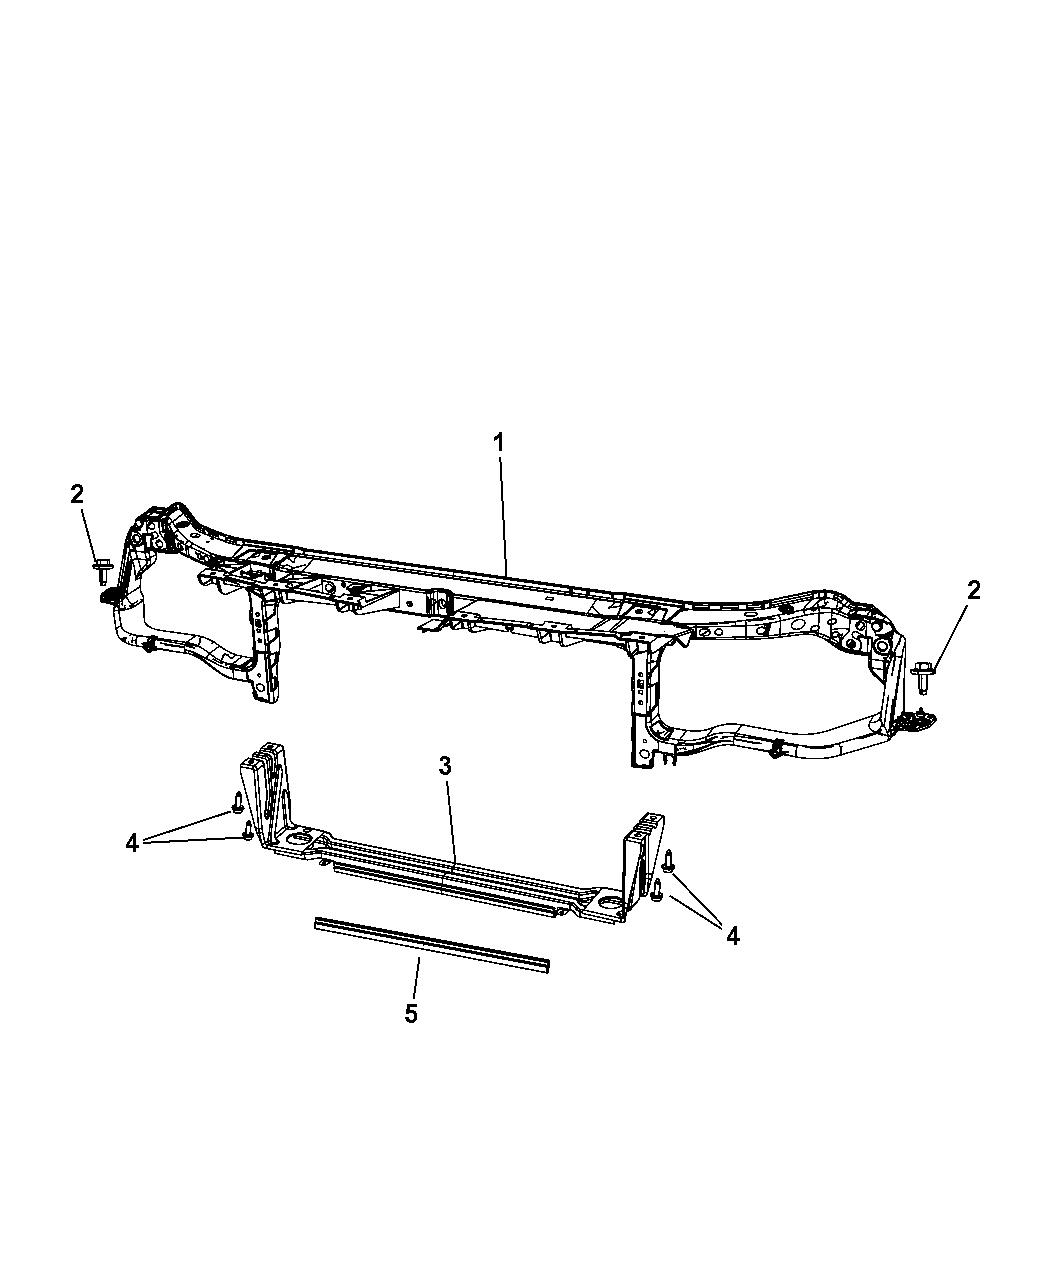 2012 Dodge Challenger Radiator Support - Mopar Parts Giant